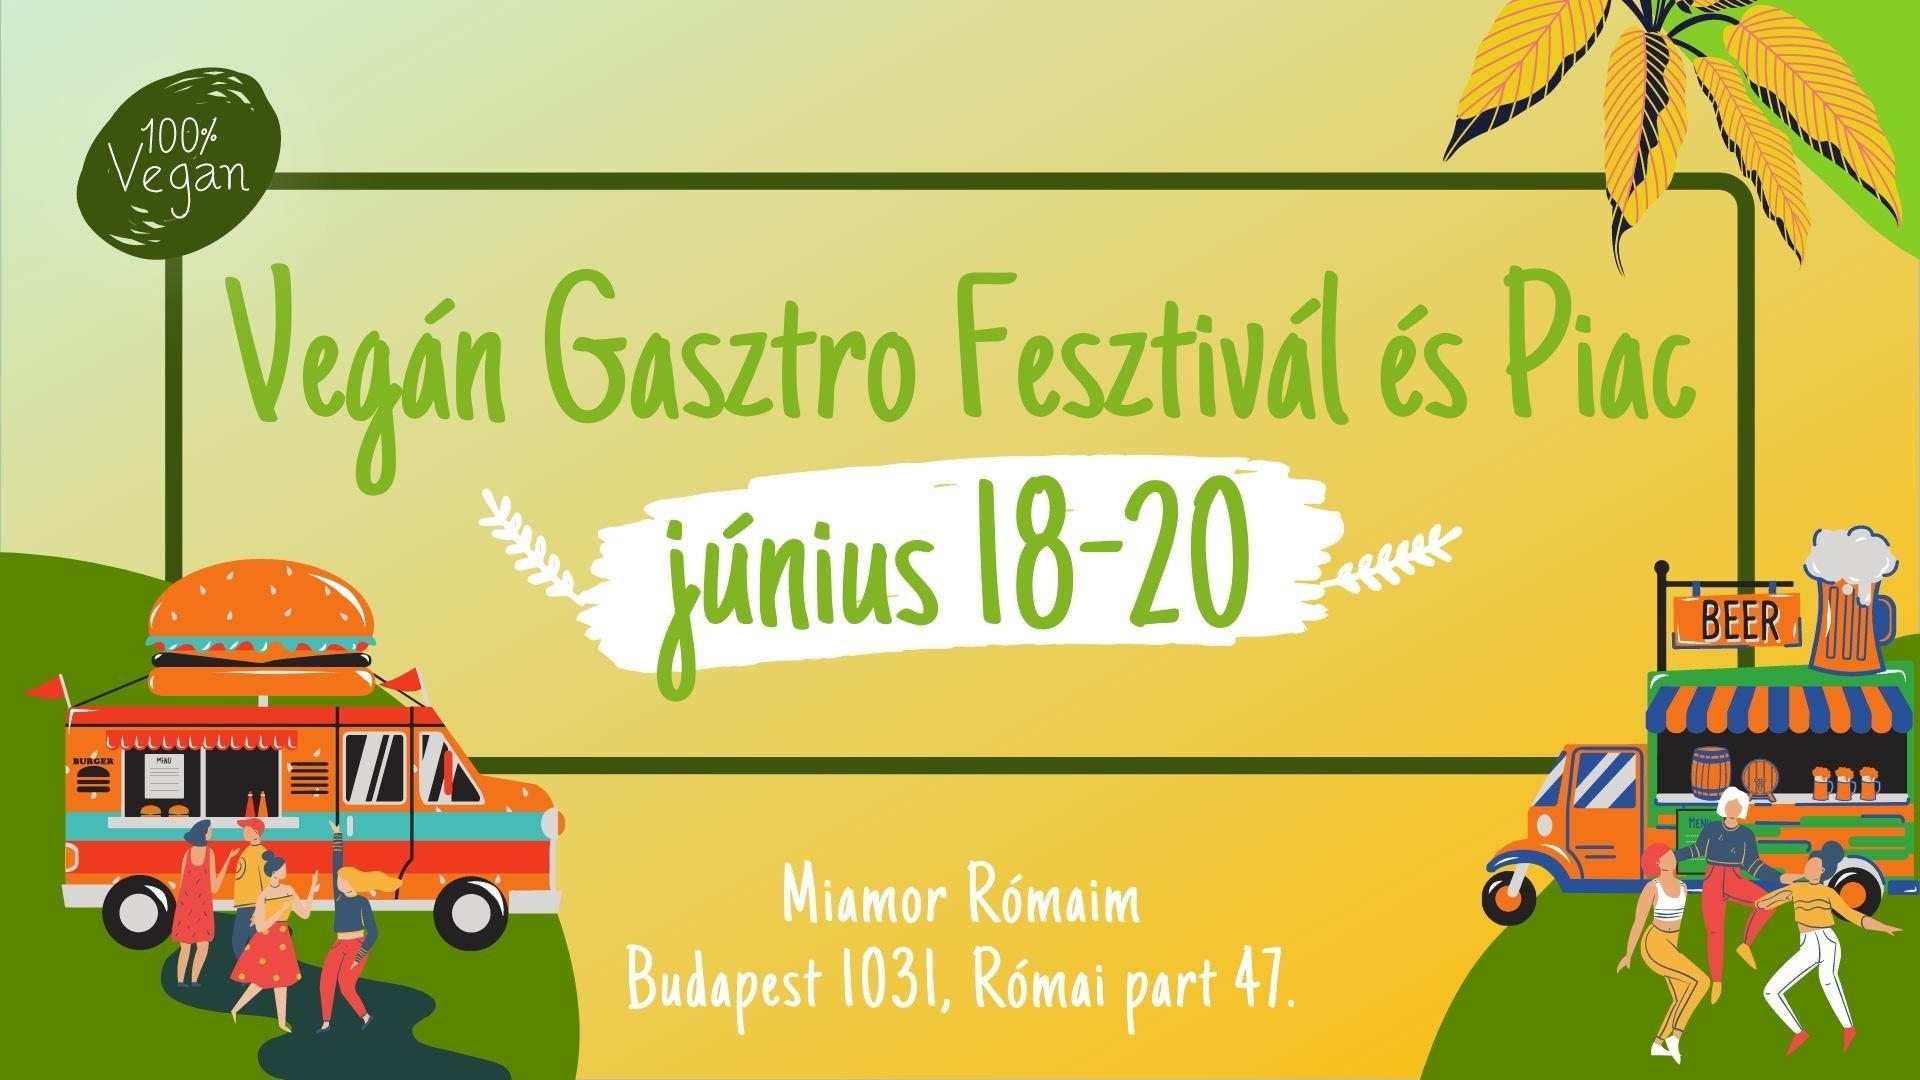 Vegan Gastro Festival